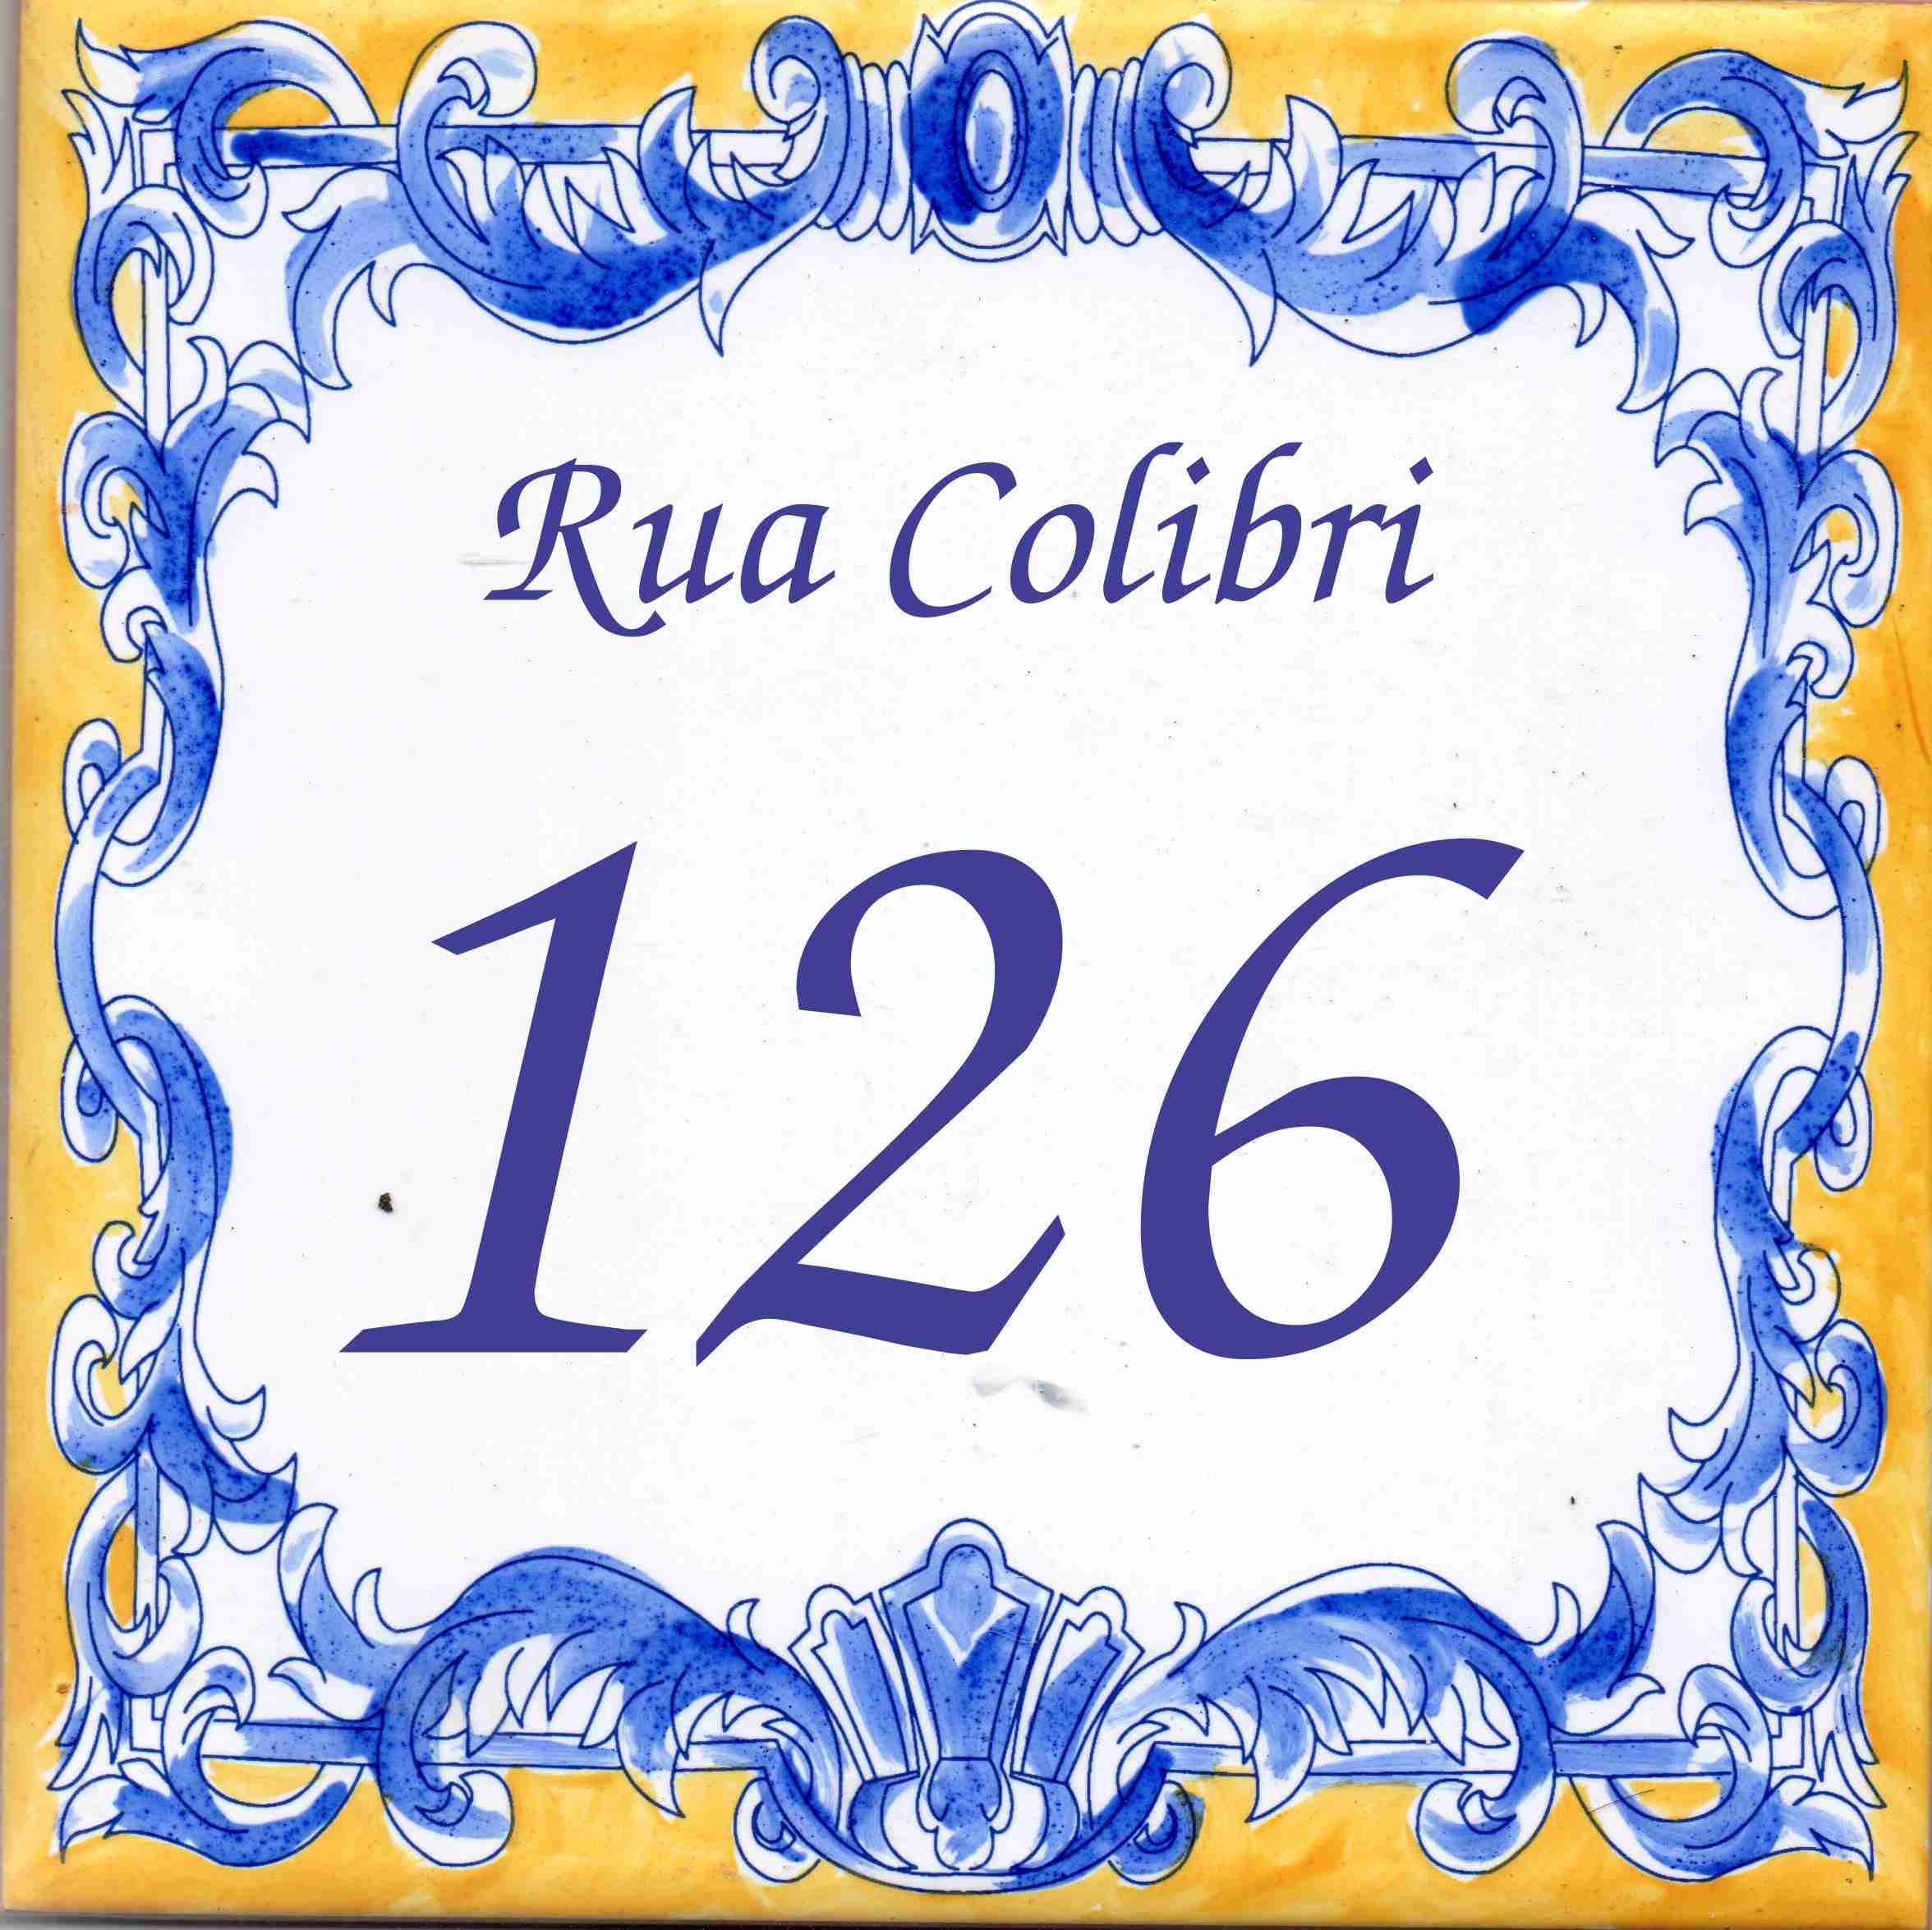 Nºmero para casa em azulejo estilo Portugues